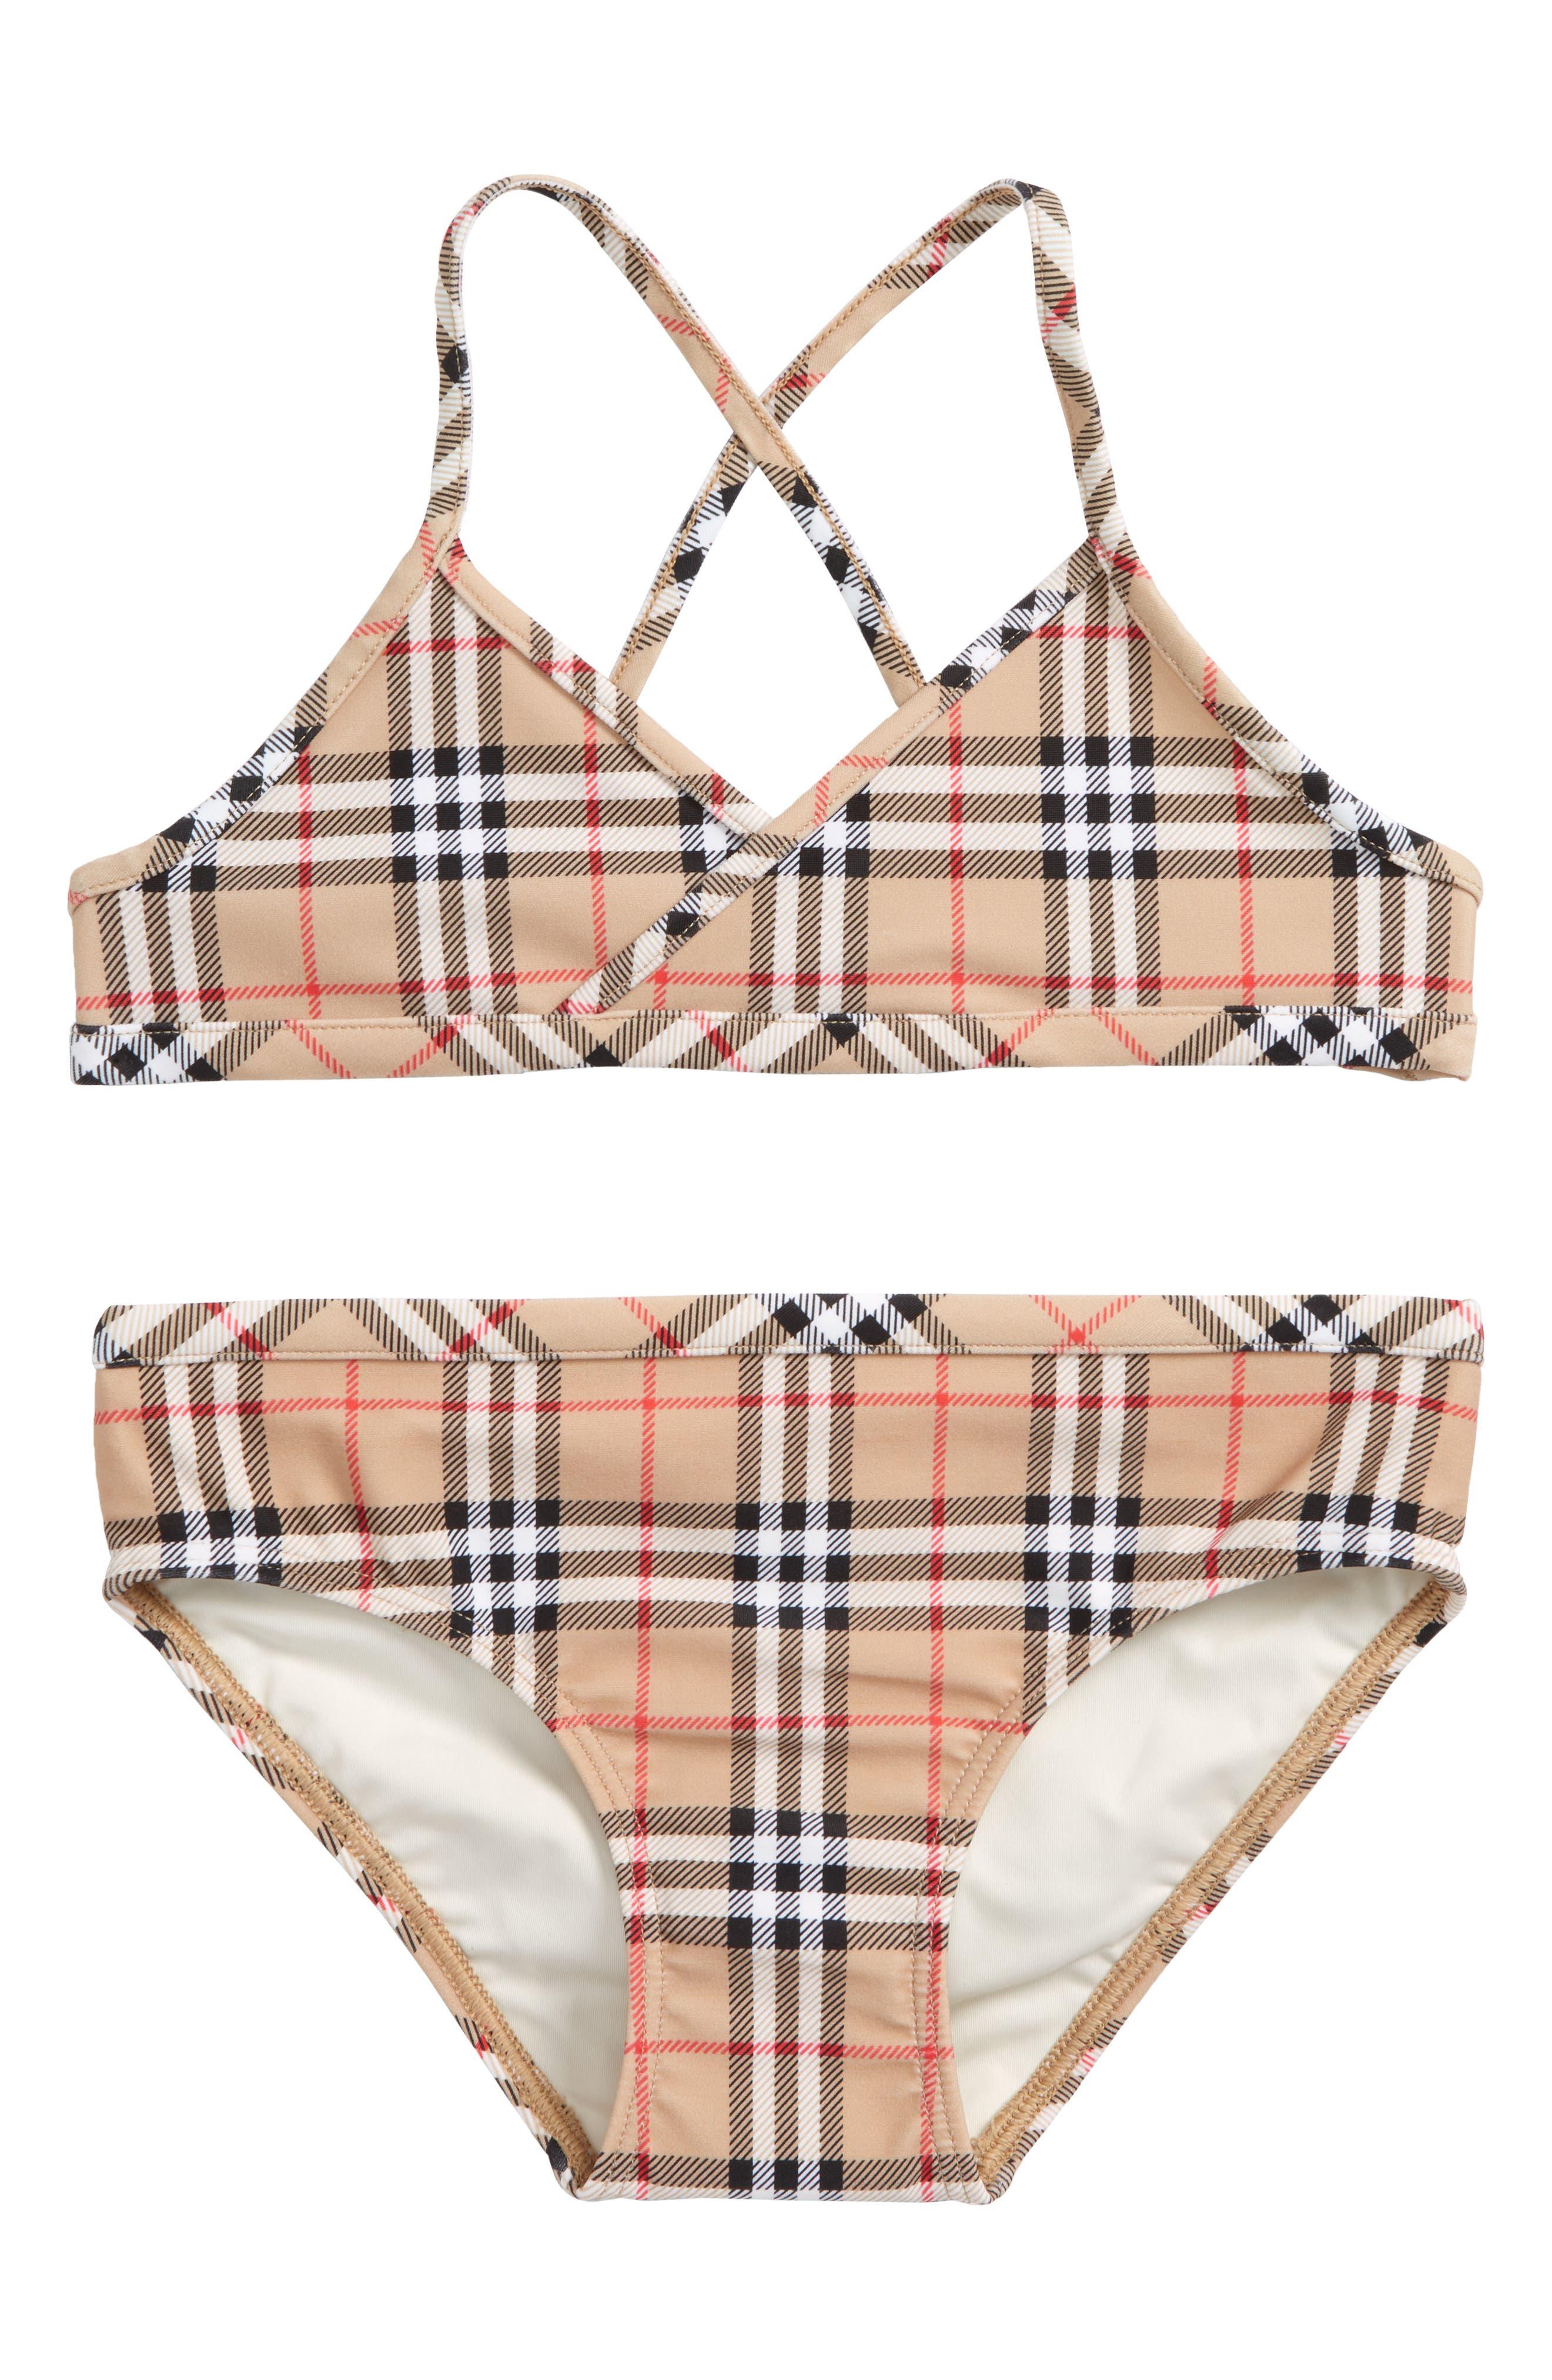 burberry baby girl bikini